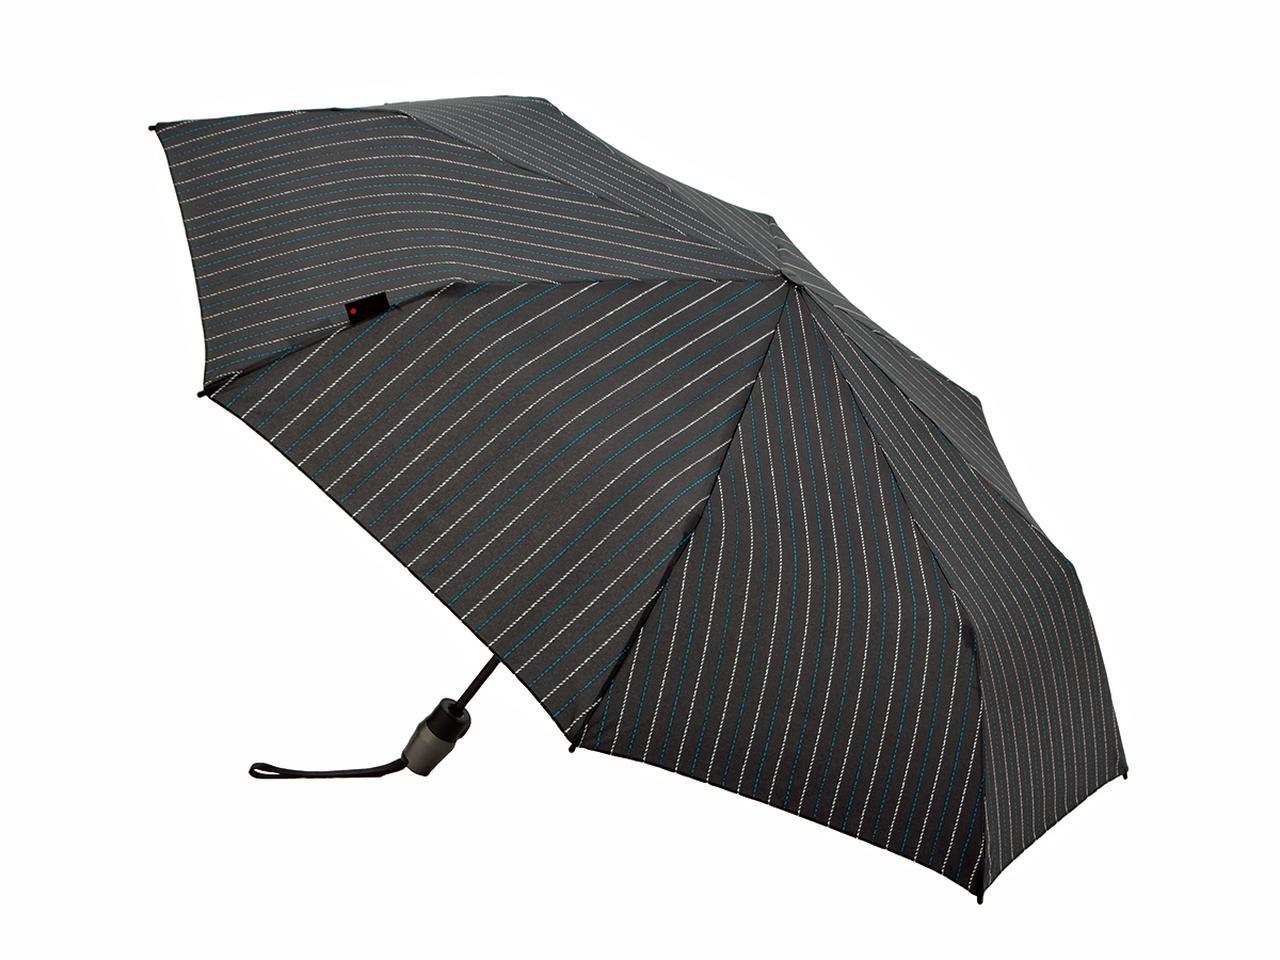 Images : 6番目の画像 - 「クニルプス」自動開閉式折りたたみ傘 - Webモーターマガジン